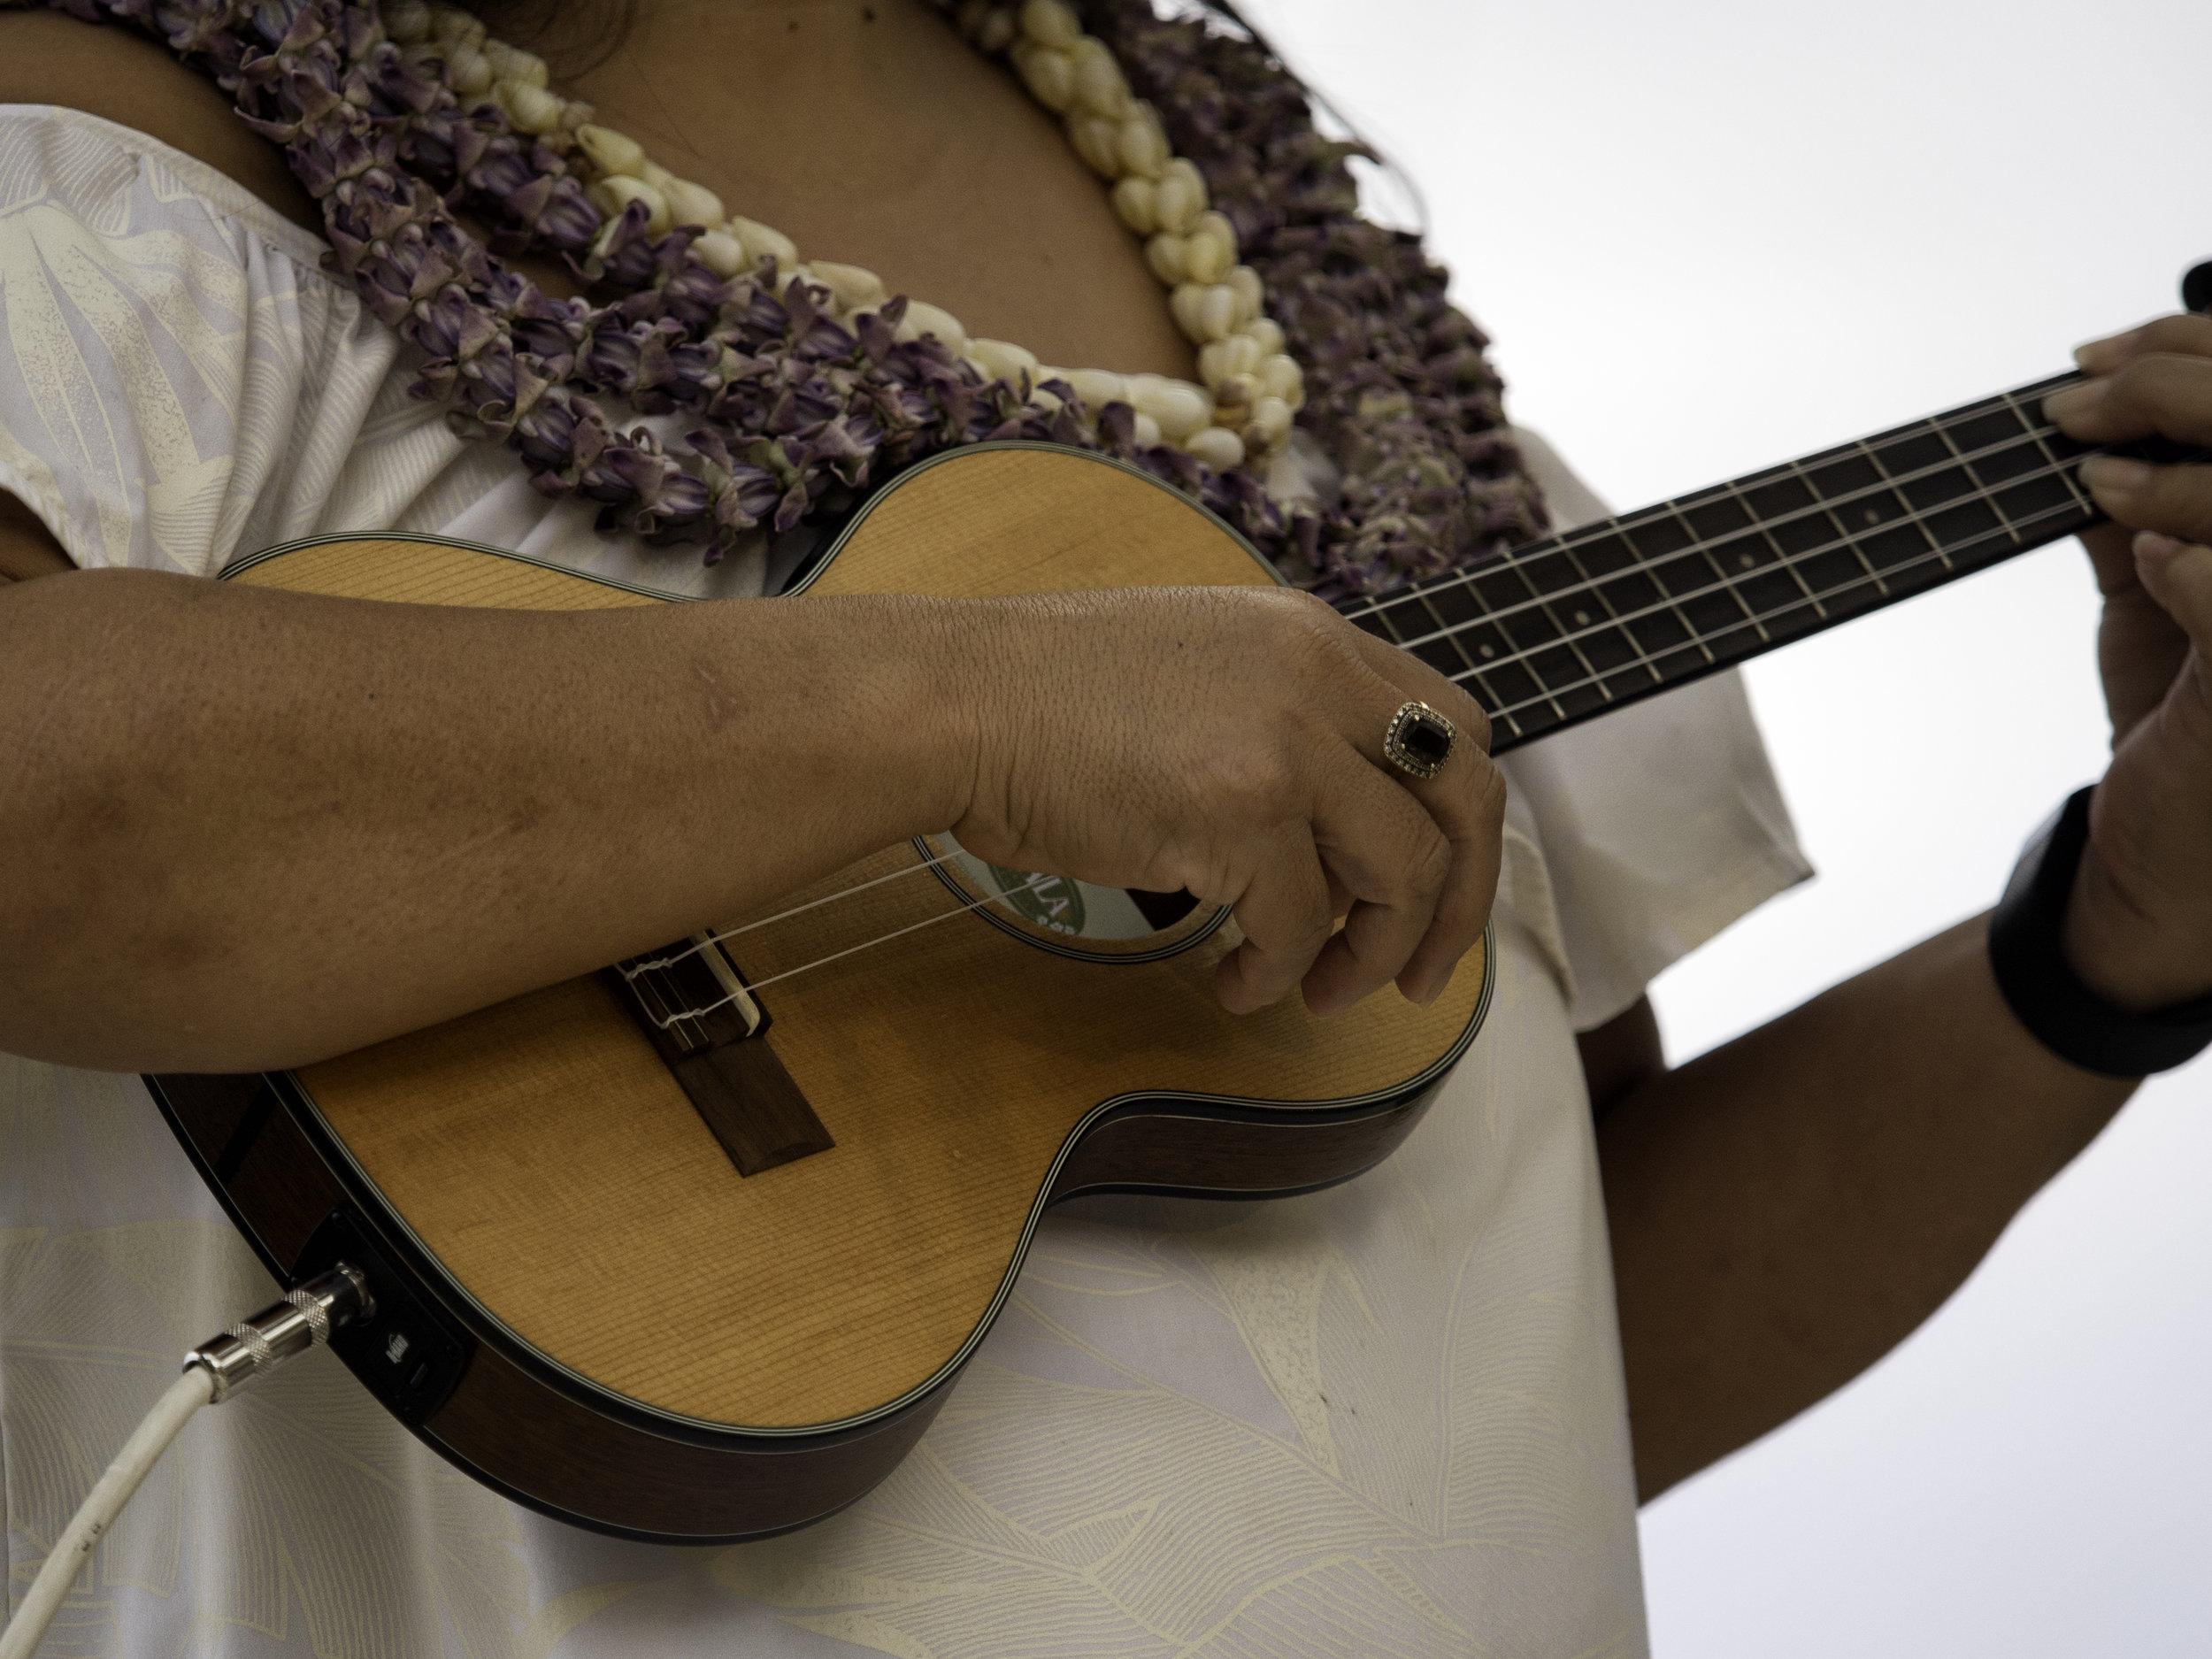 Musings by the Glass - Mele Kalikimaka - Hawaiian Christmas Music and Wine Pairings - Ukulele